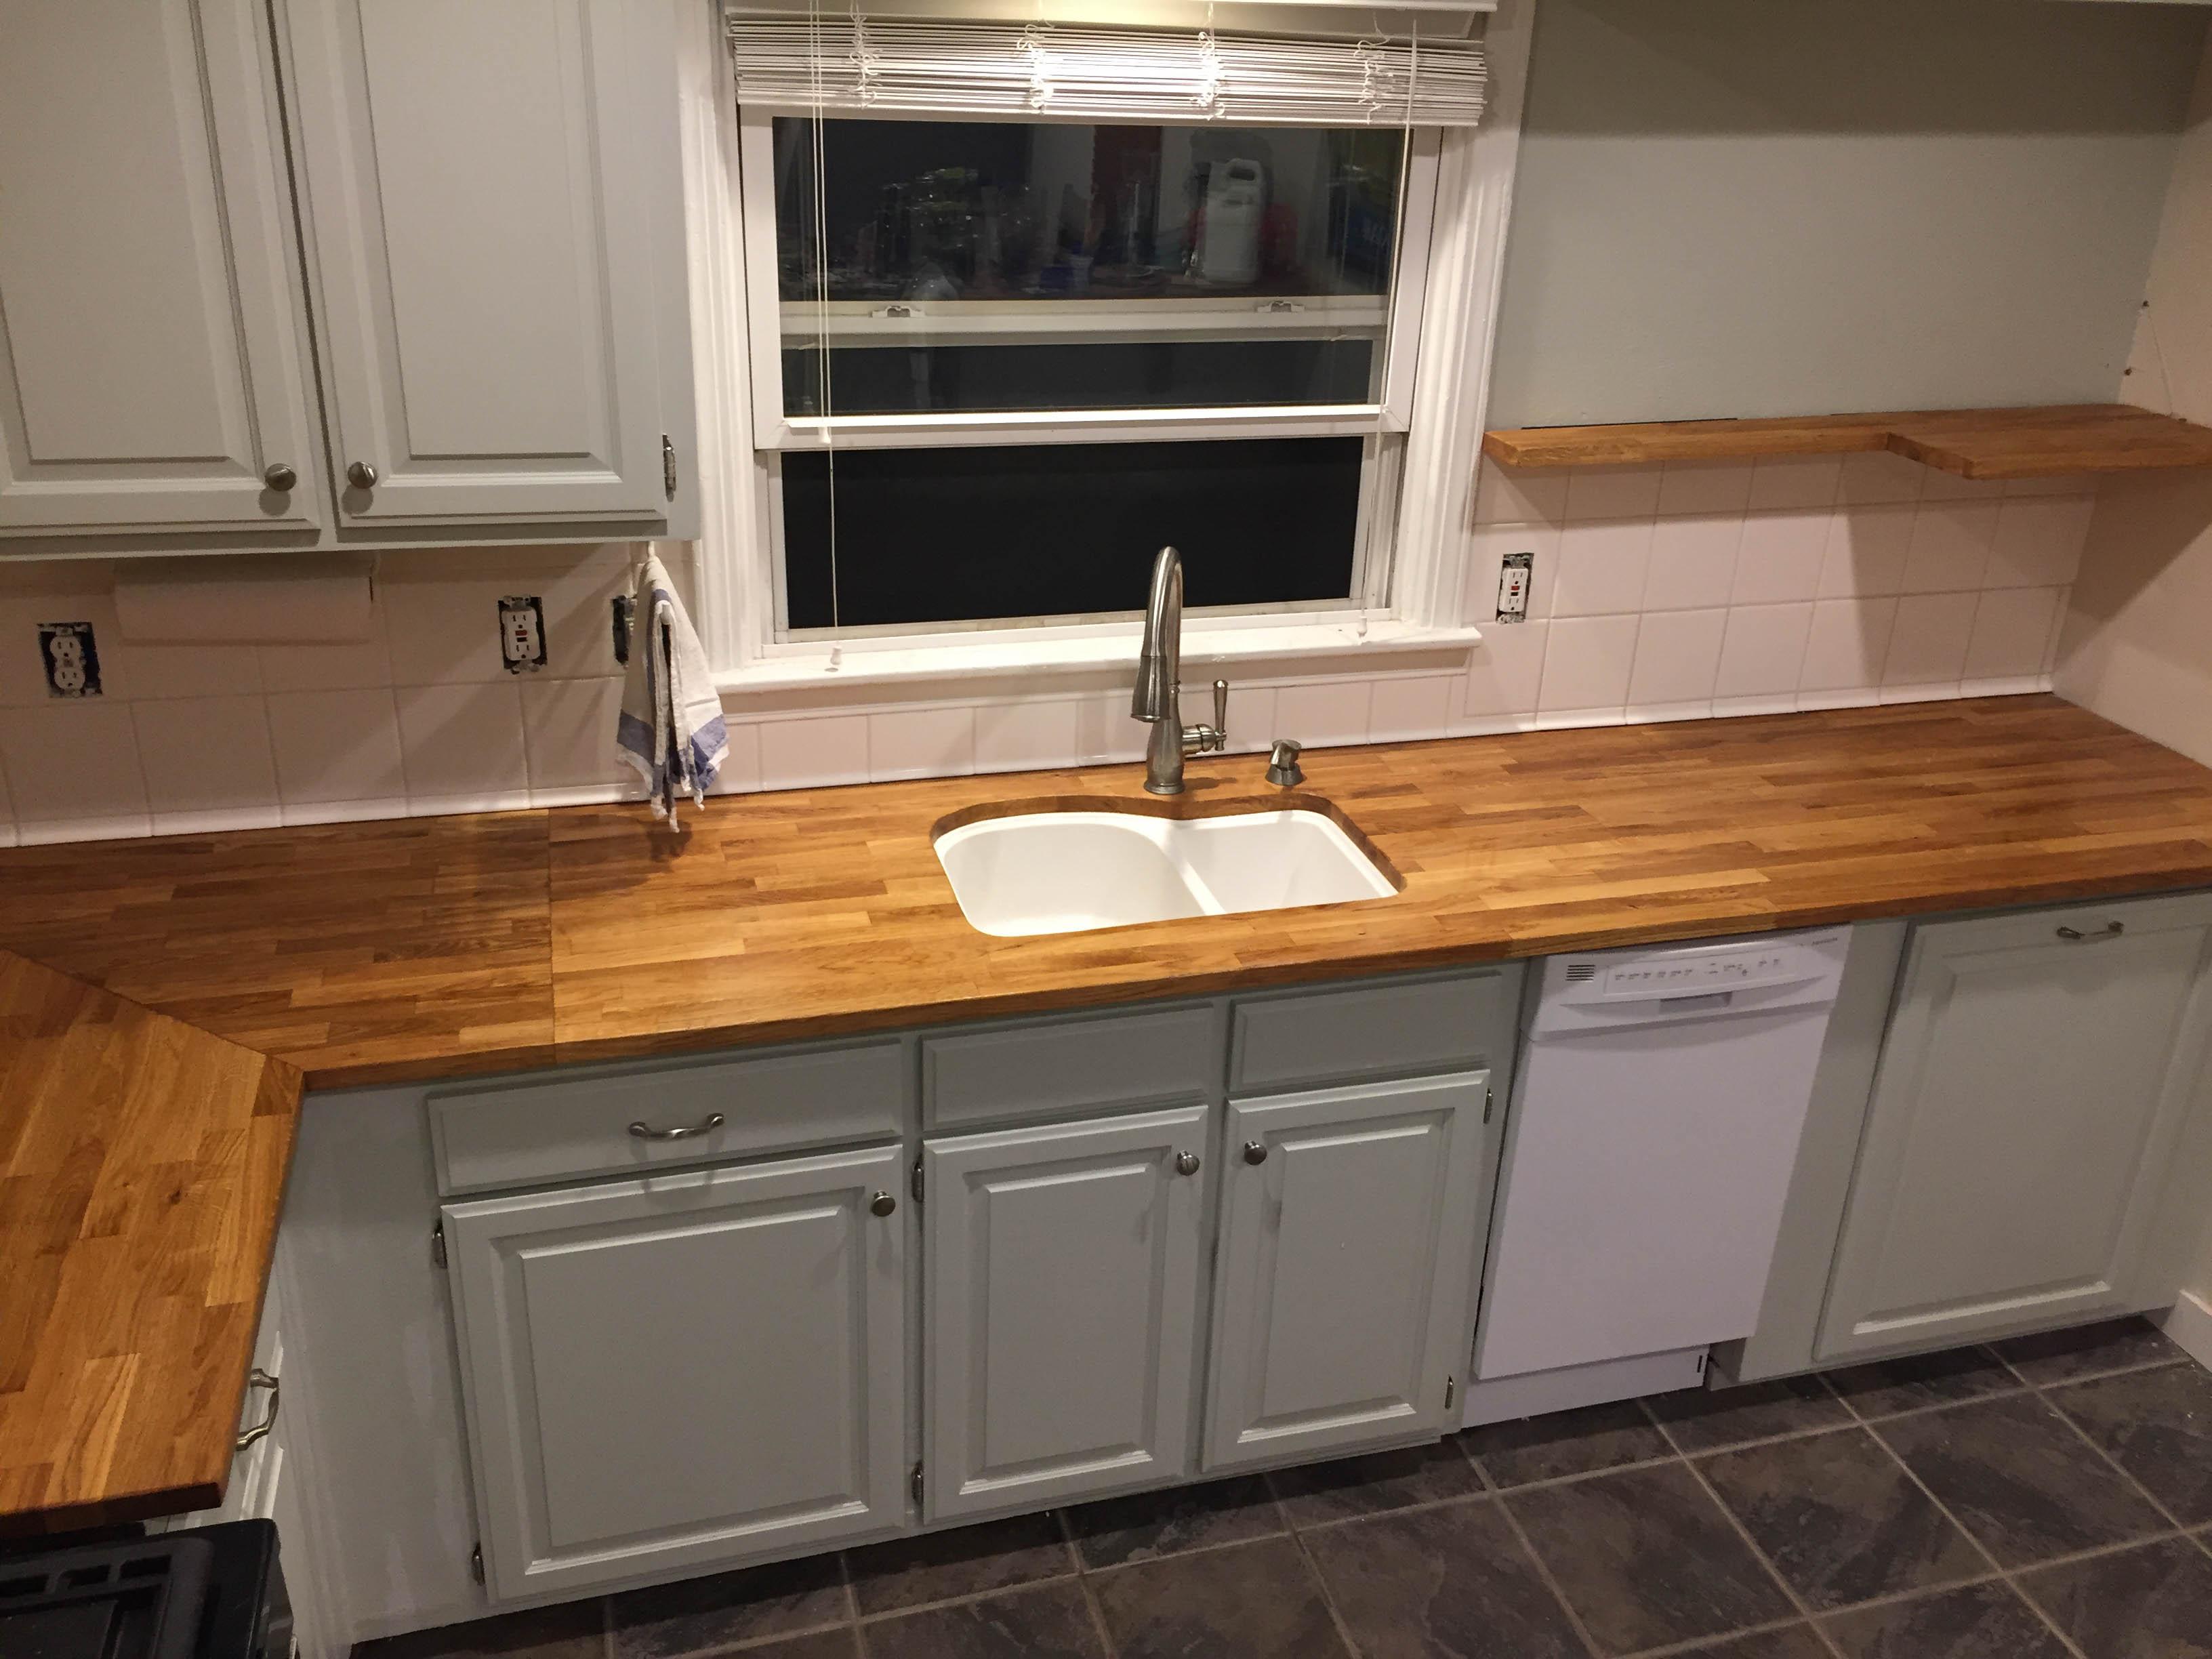 Upgrade my kitchen sink hardwood floors in kitchen create my kitchen upgrade kitchen for Upgraded kitchen ideas